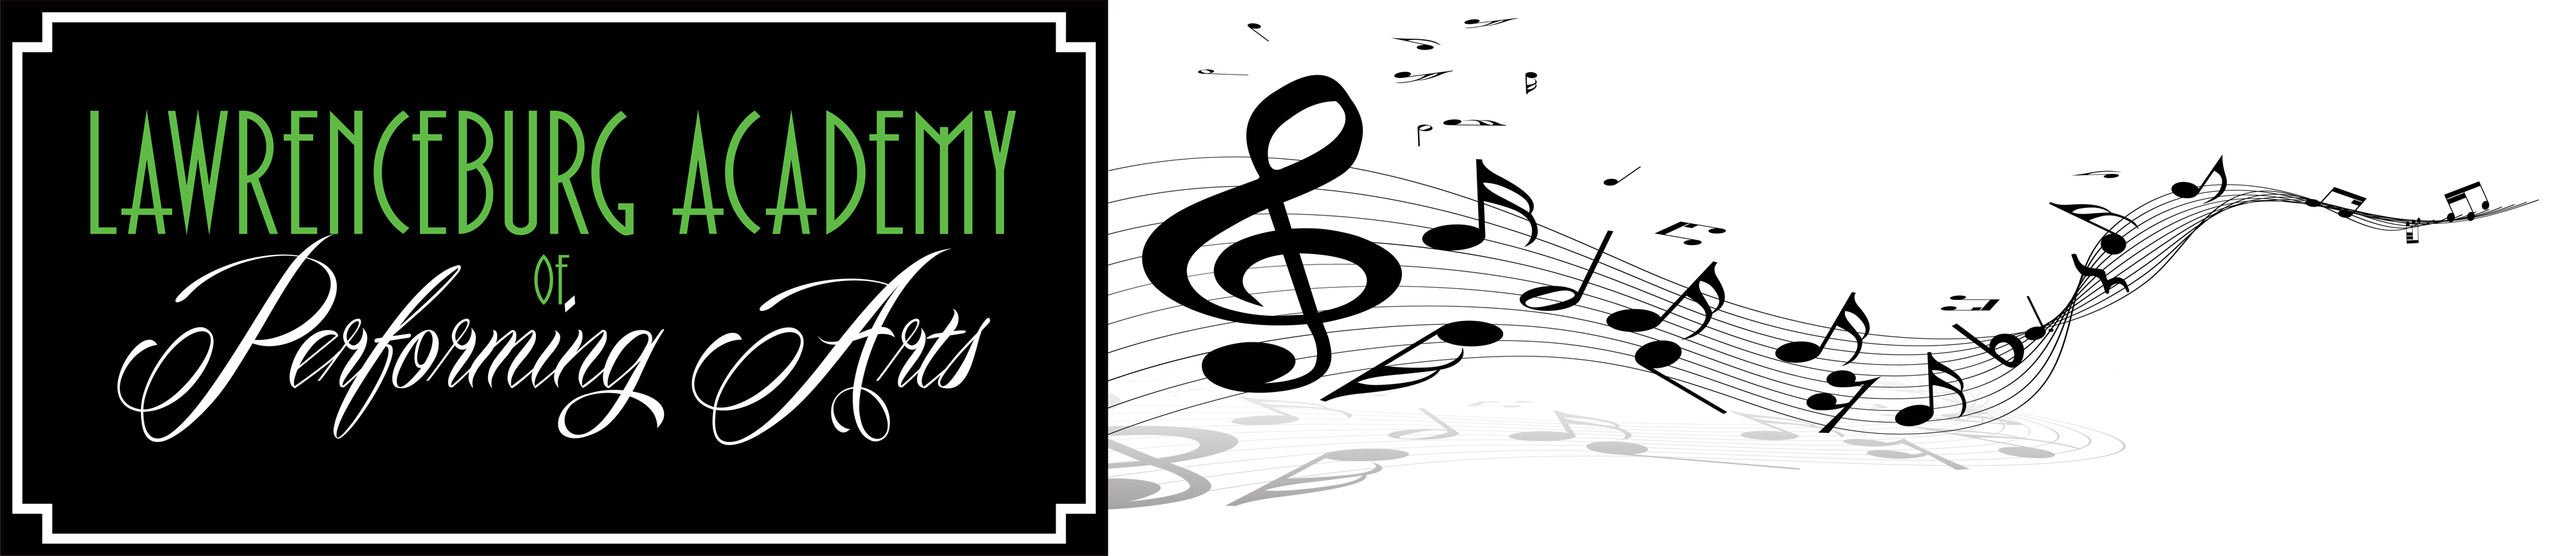 Lawrenceburg Academy of Performing Arts Logo